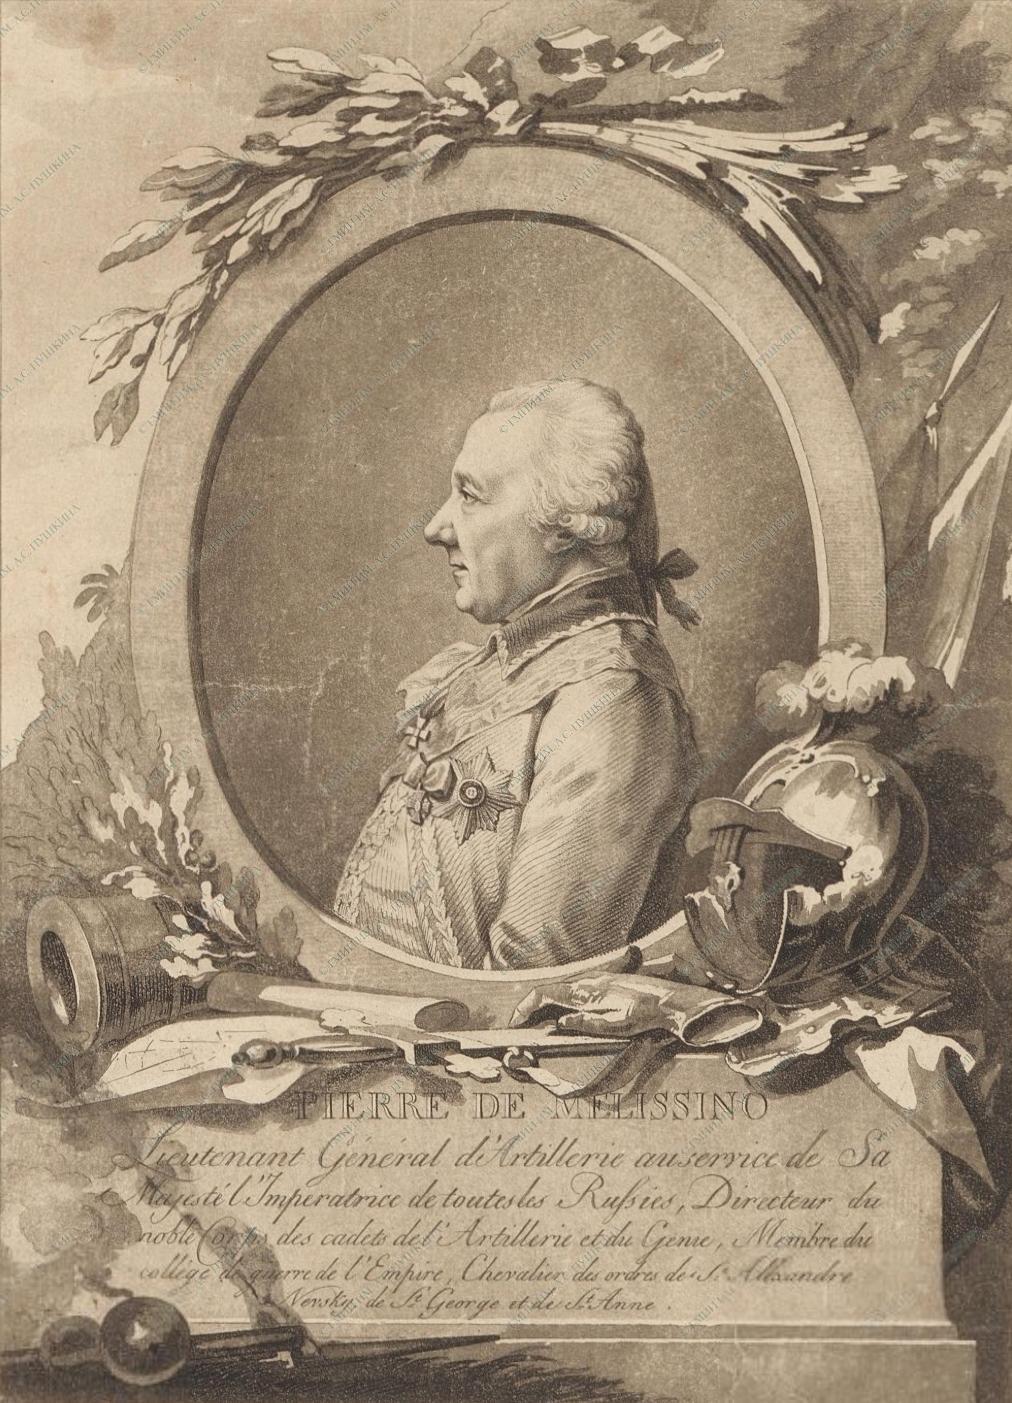 File:Melissino (1726 -1797) Greek Russia.jpg